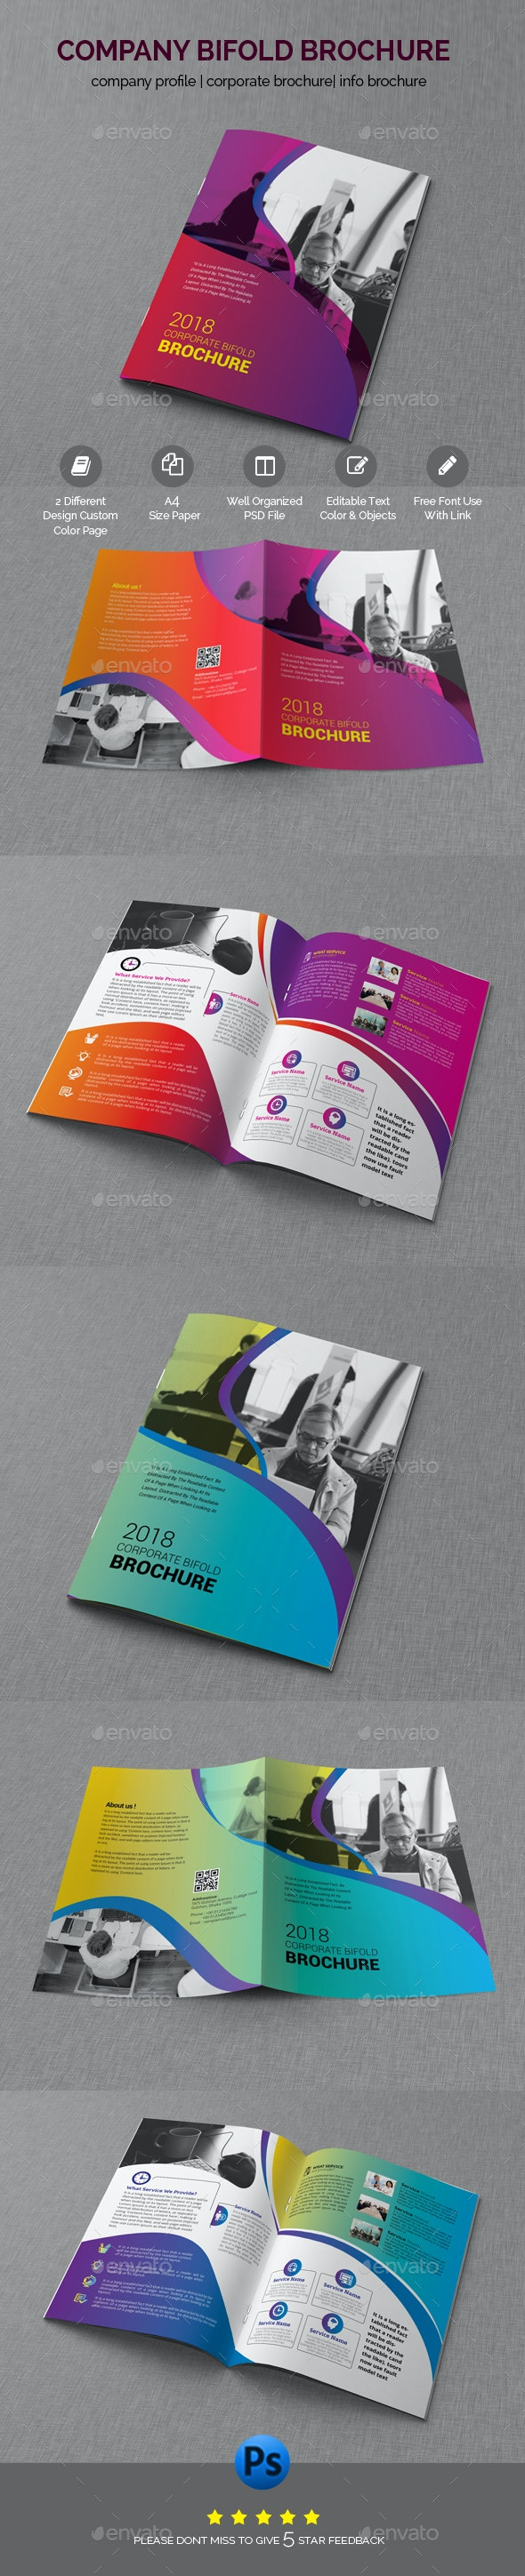 Professional Bifold Brochure Template - Brochures Print Templates